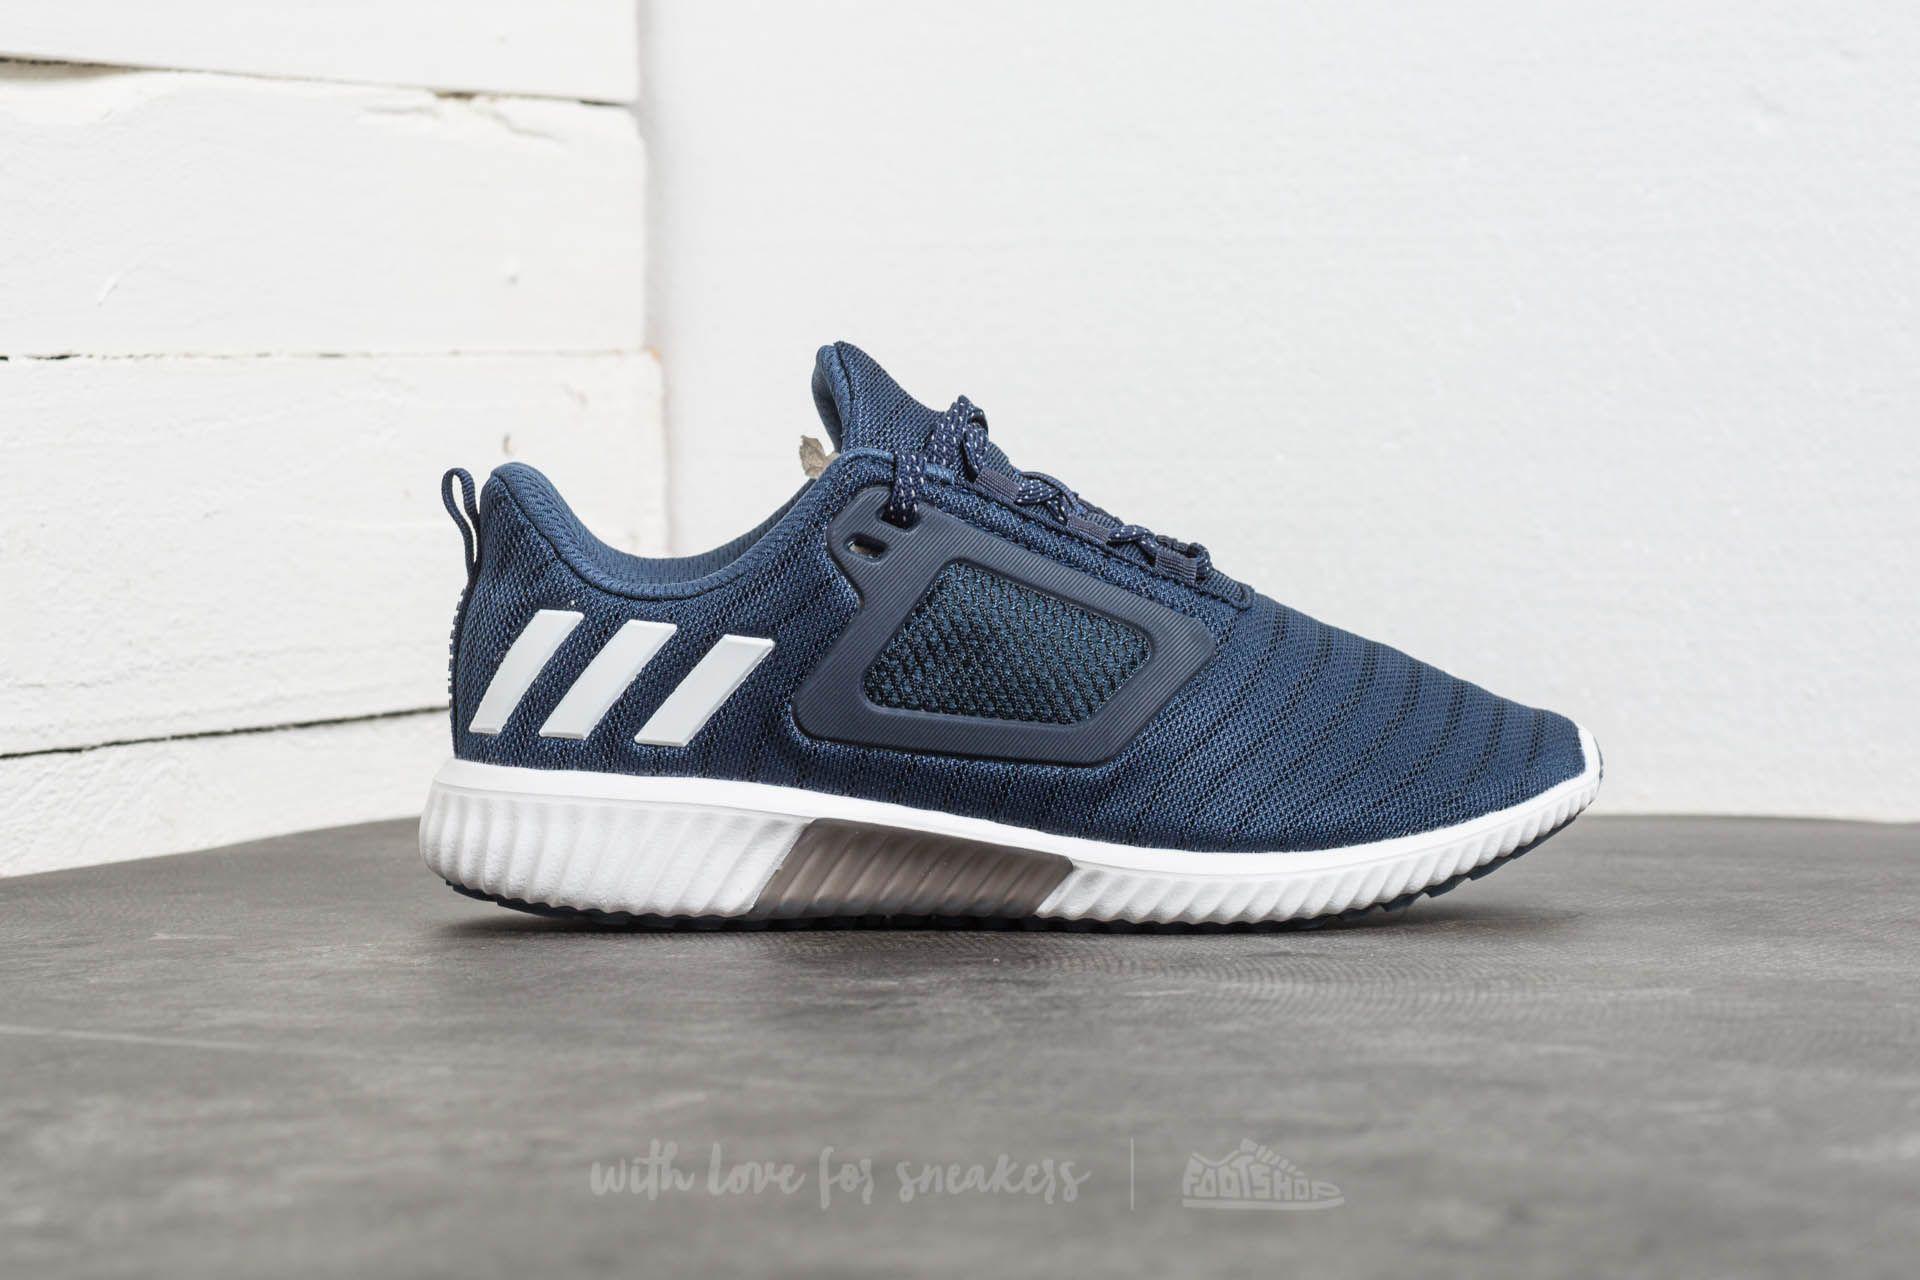 detailed look 3ef9a 42233 Lyst - adidas Originals Adidas Climacool Cw Collegiate Navy